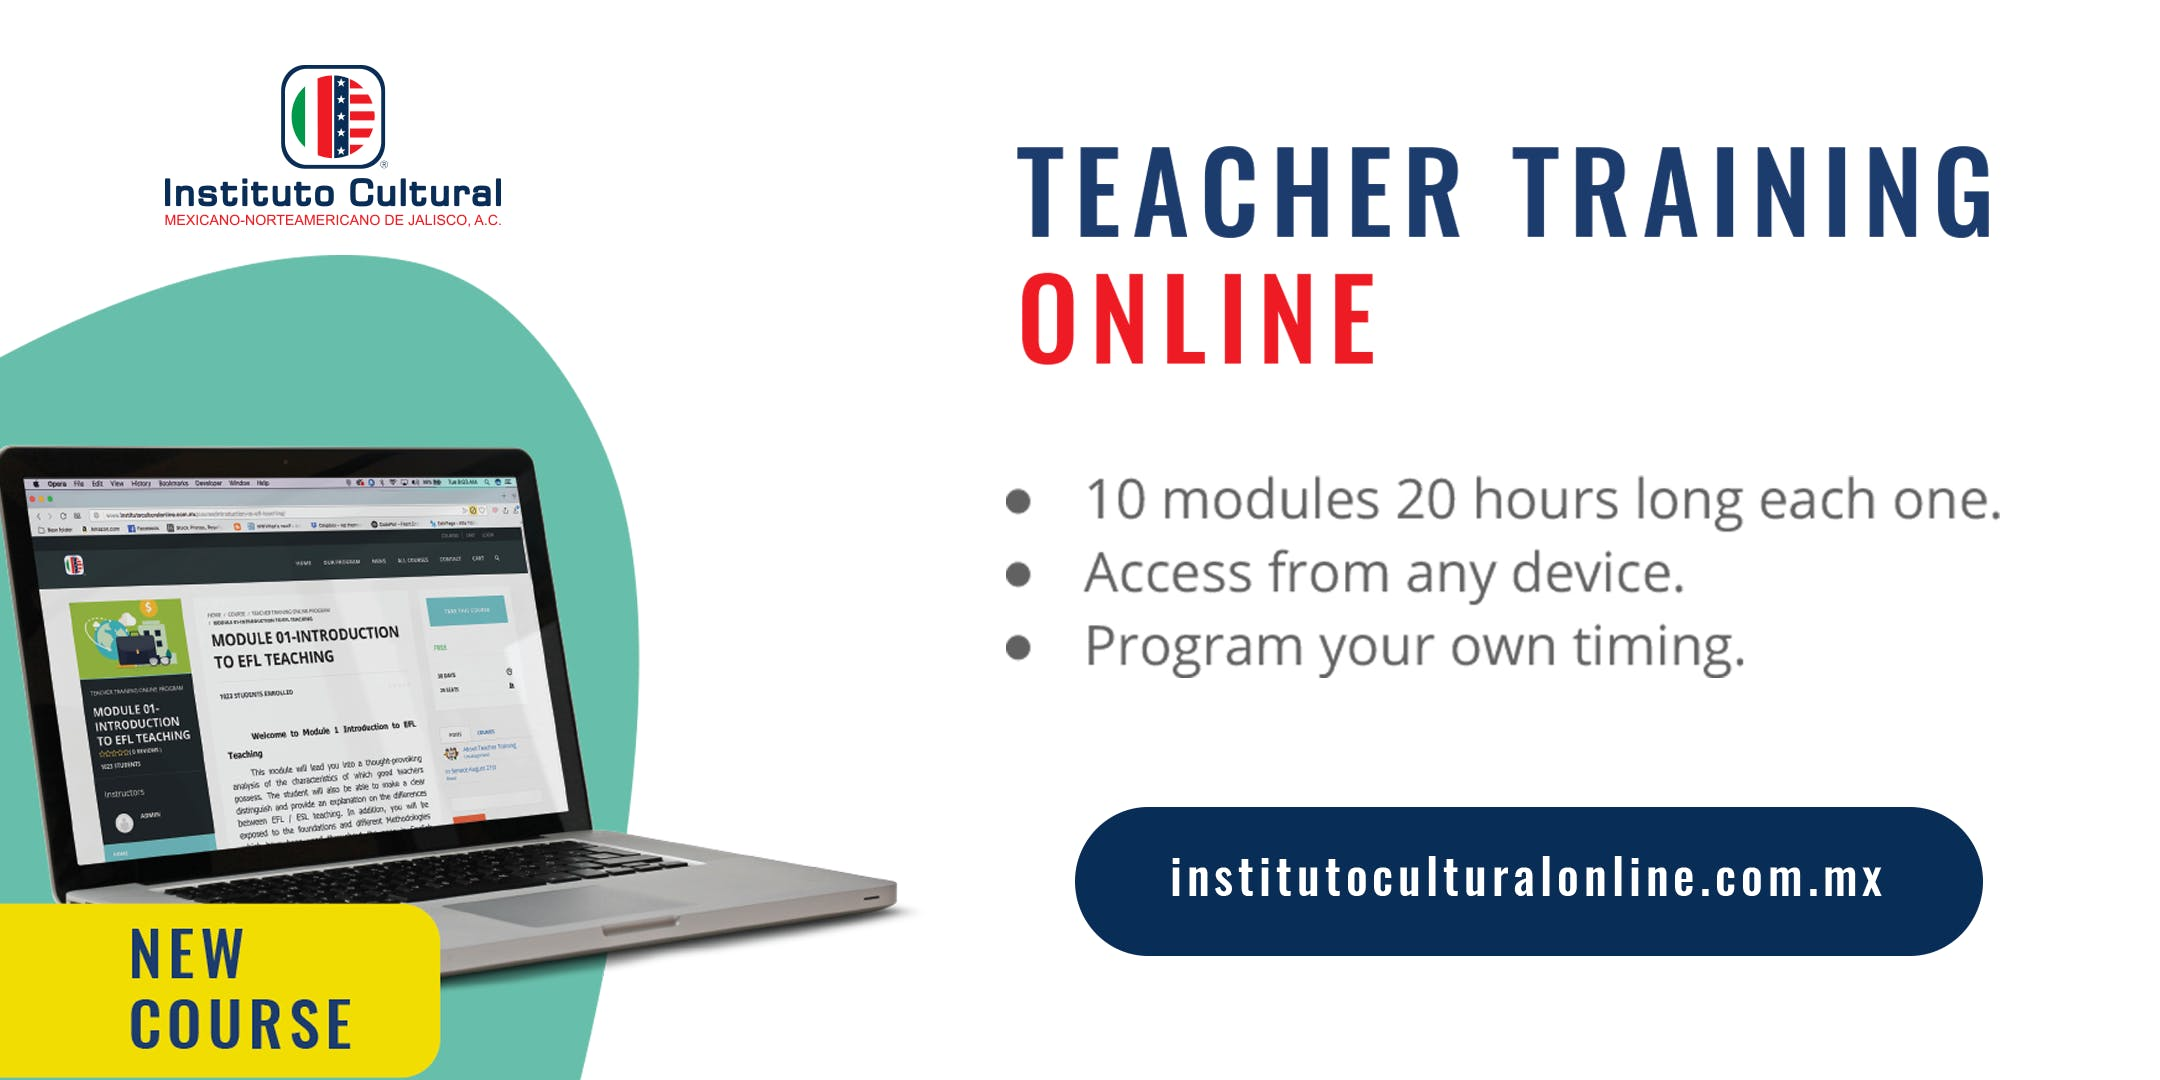 Presentación Teacher Training Online